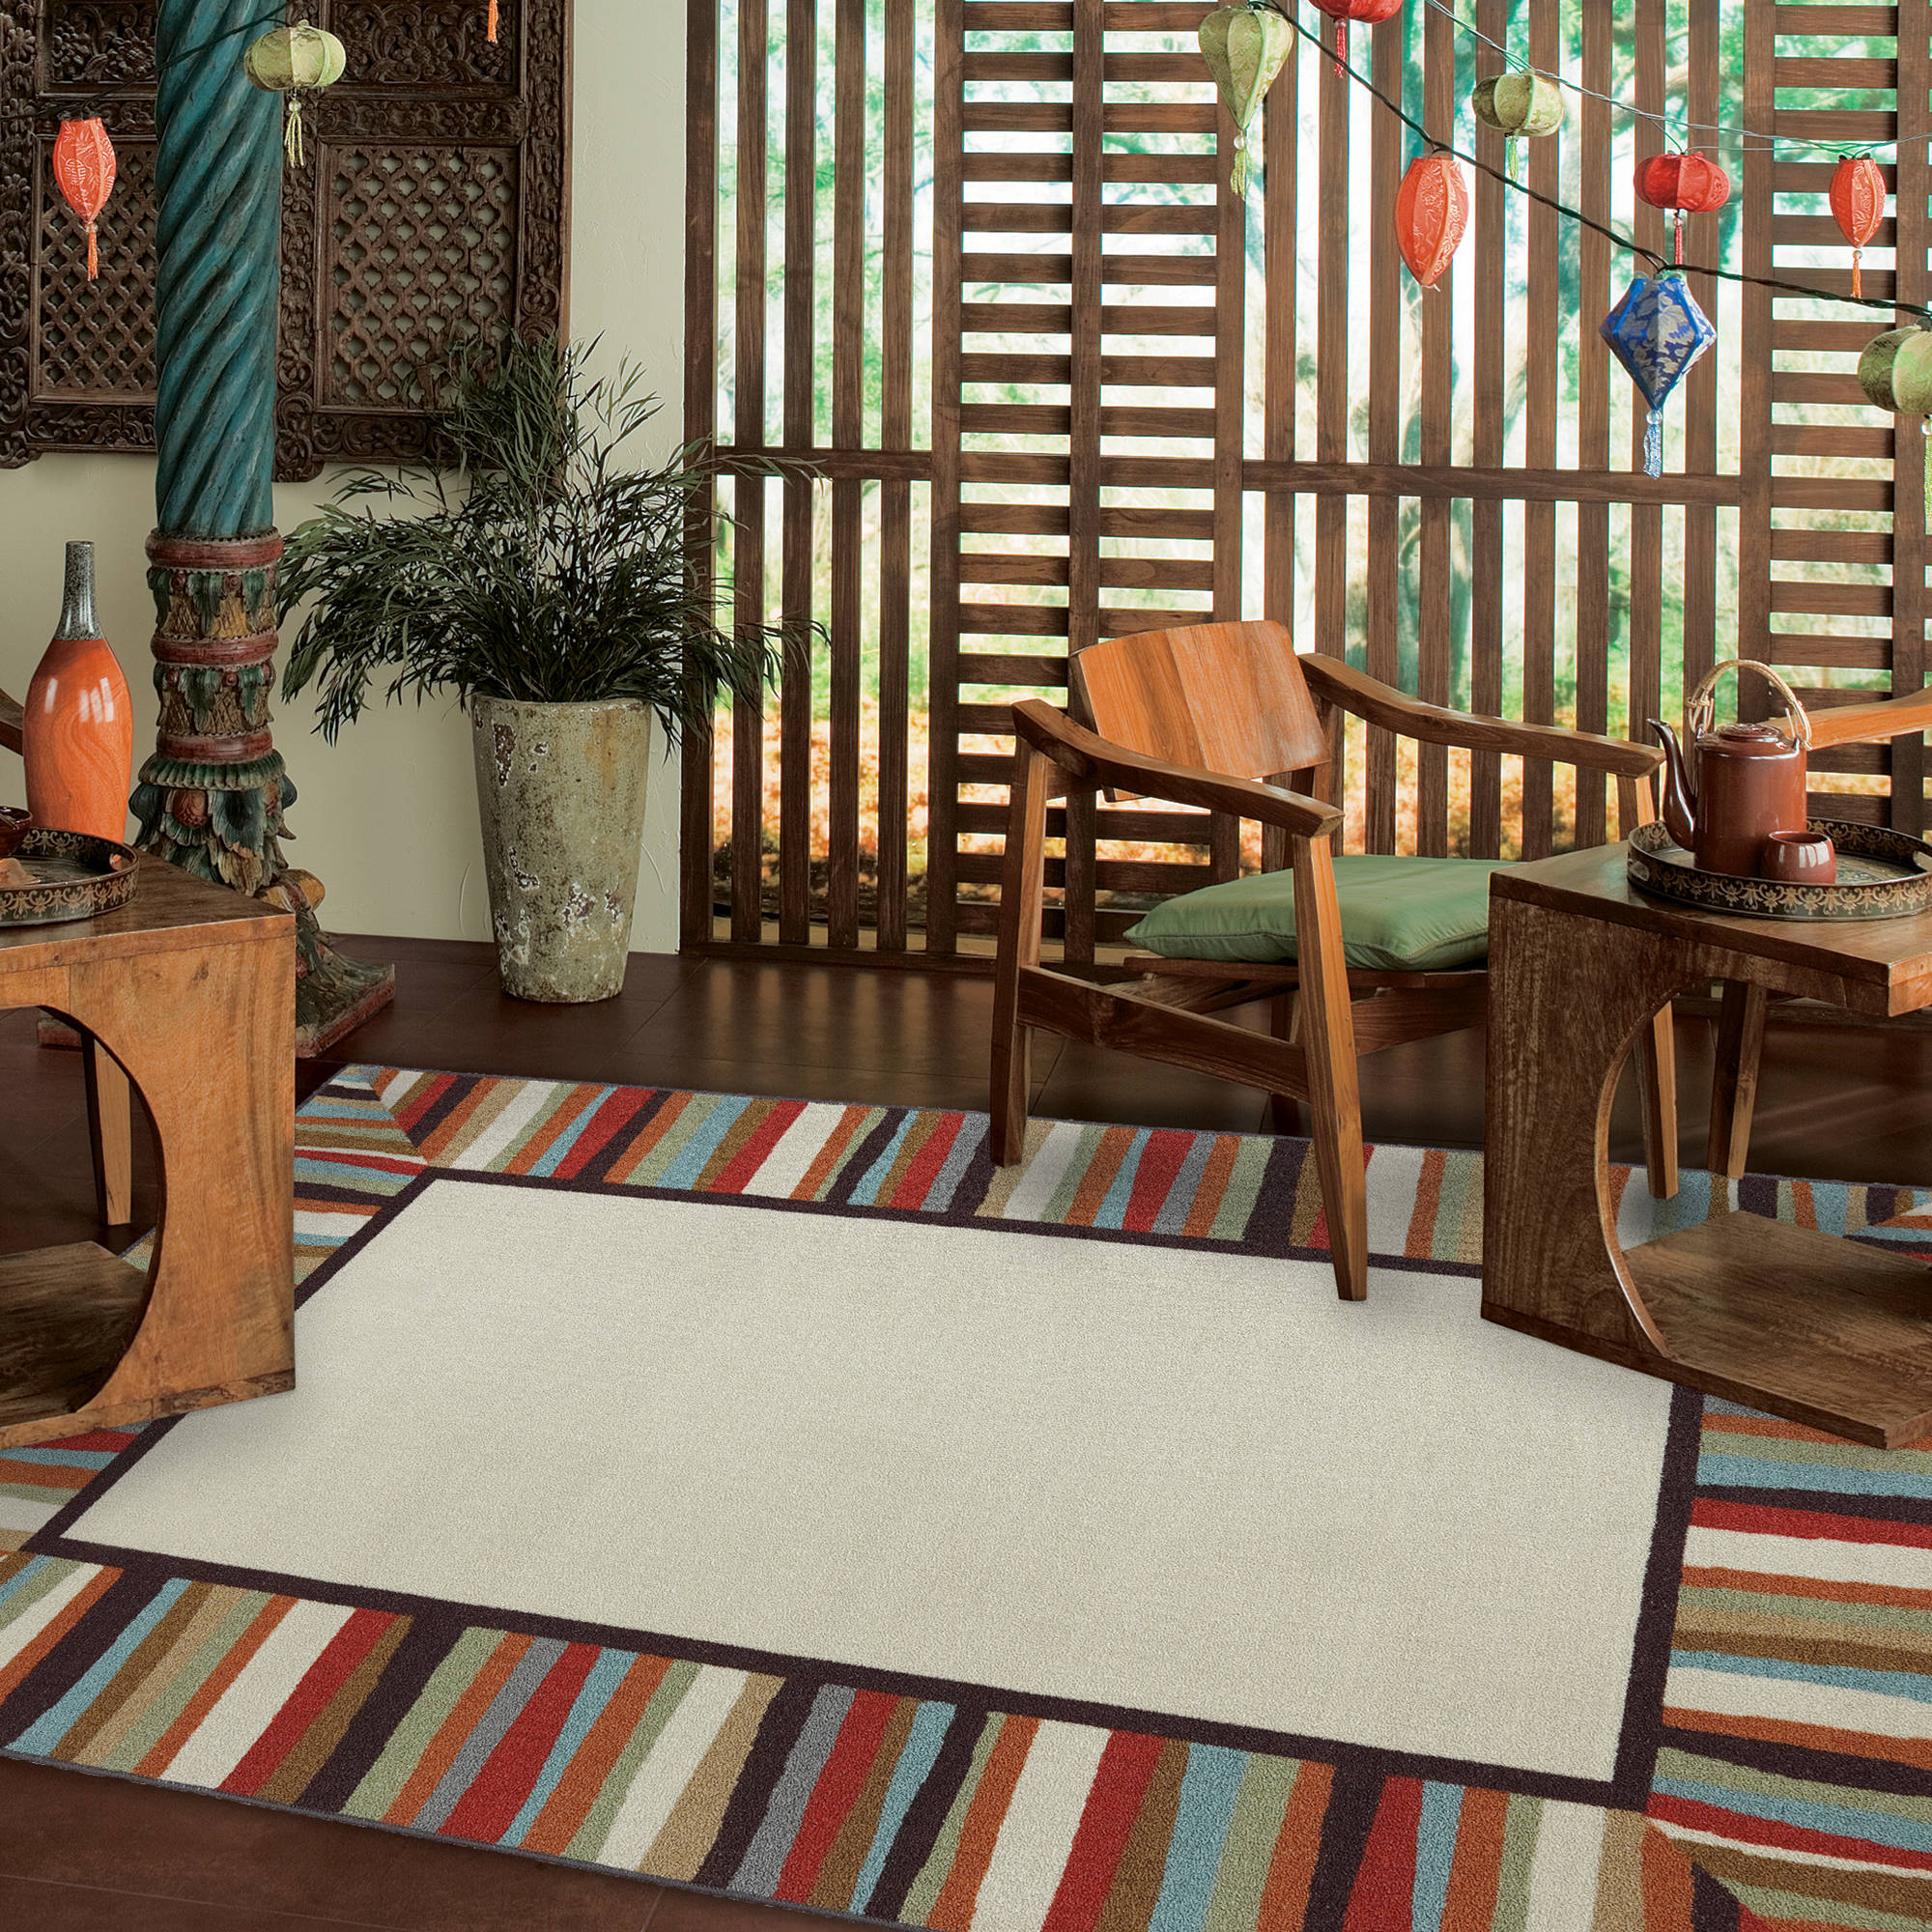 Mohawk Home Patio Border Indoor Outdoor Nylon Rug Rainbow